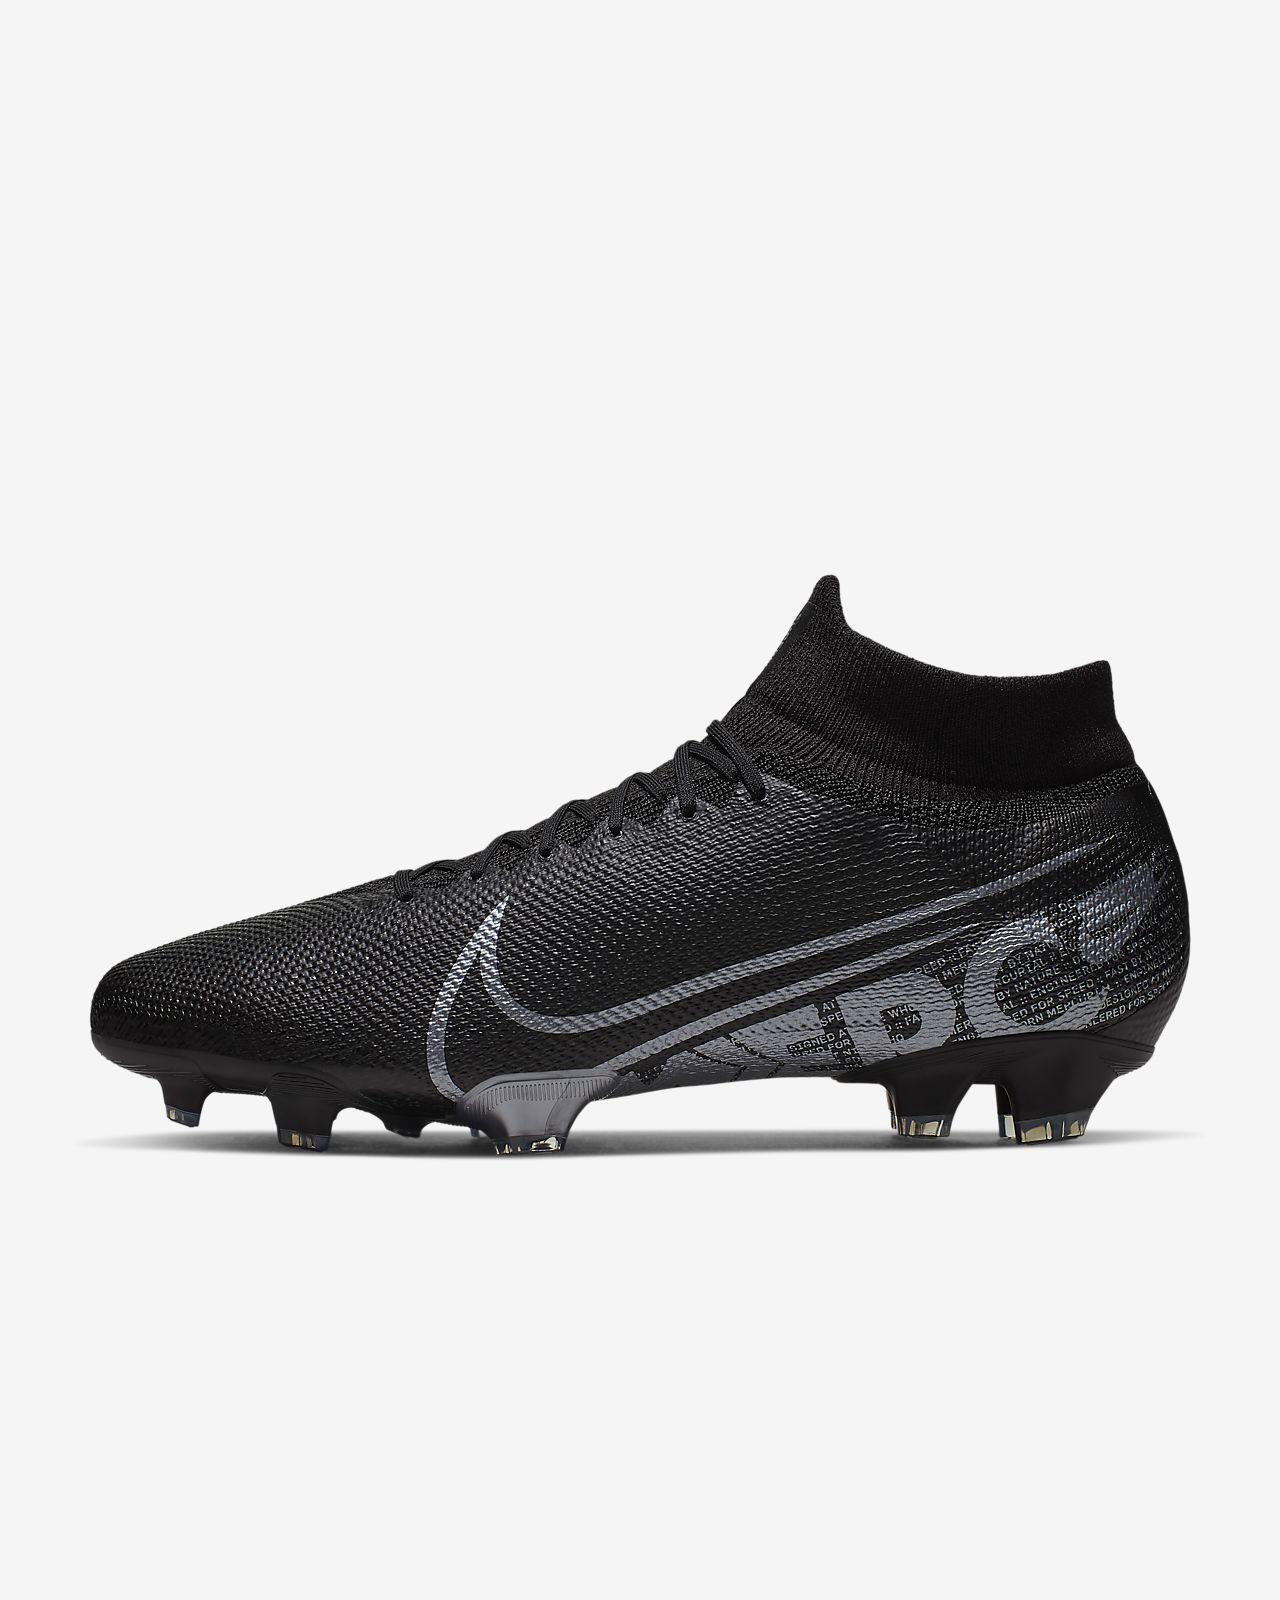 Calzado de fútbol para terreno firme Nike Mercurial Superfly 7 Pro FG